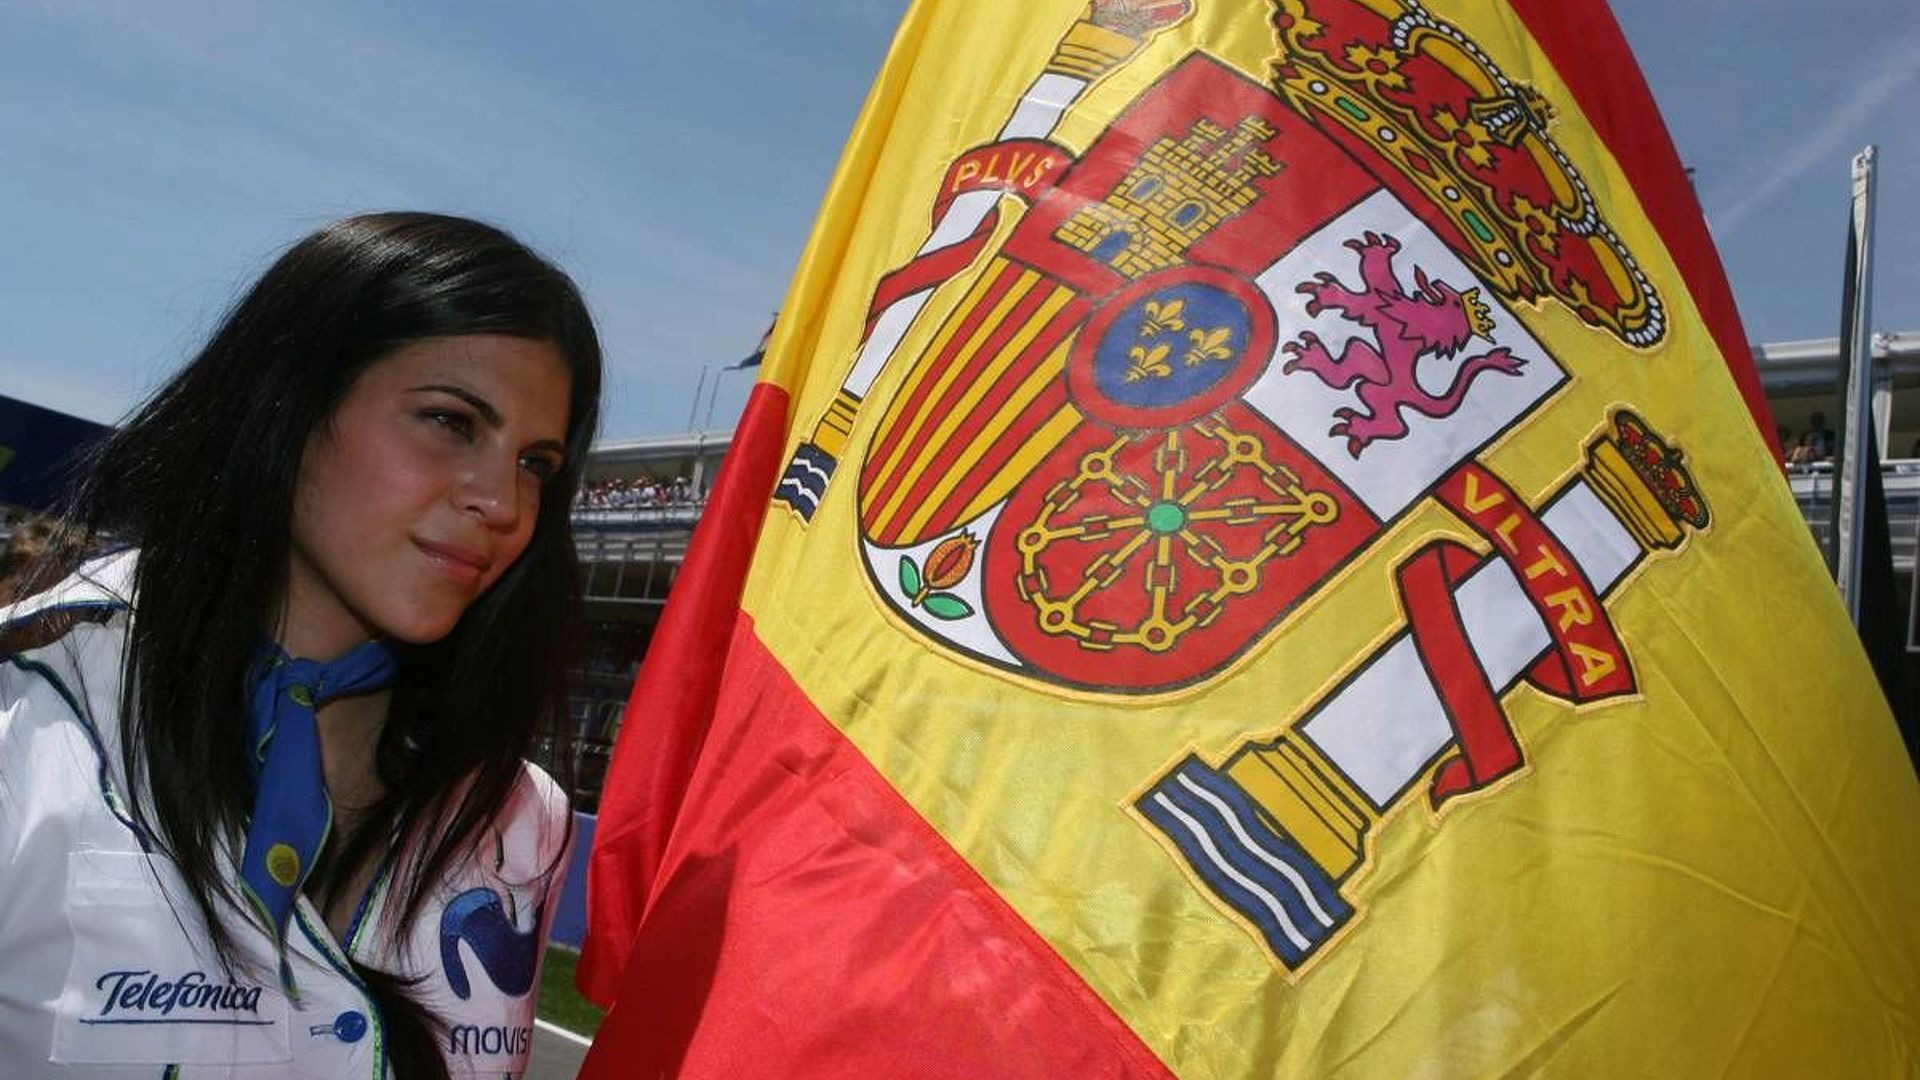 Spokeswoman denies Valencia wants to drop F1 race